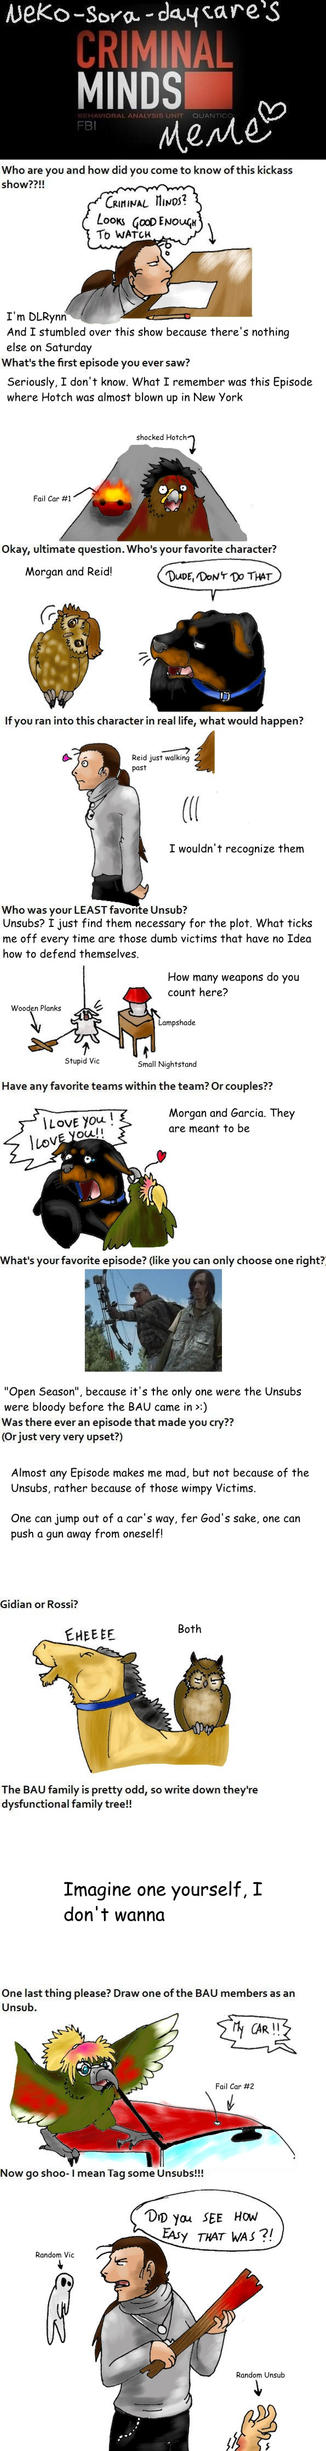 Criminal Minds Meme by DragonlordRynn on DeviantArt